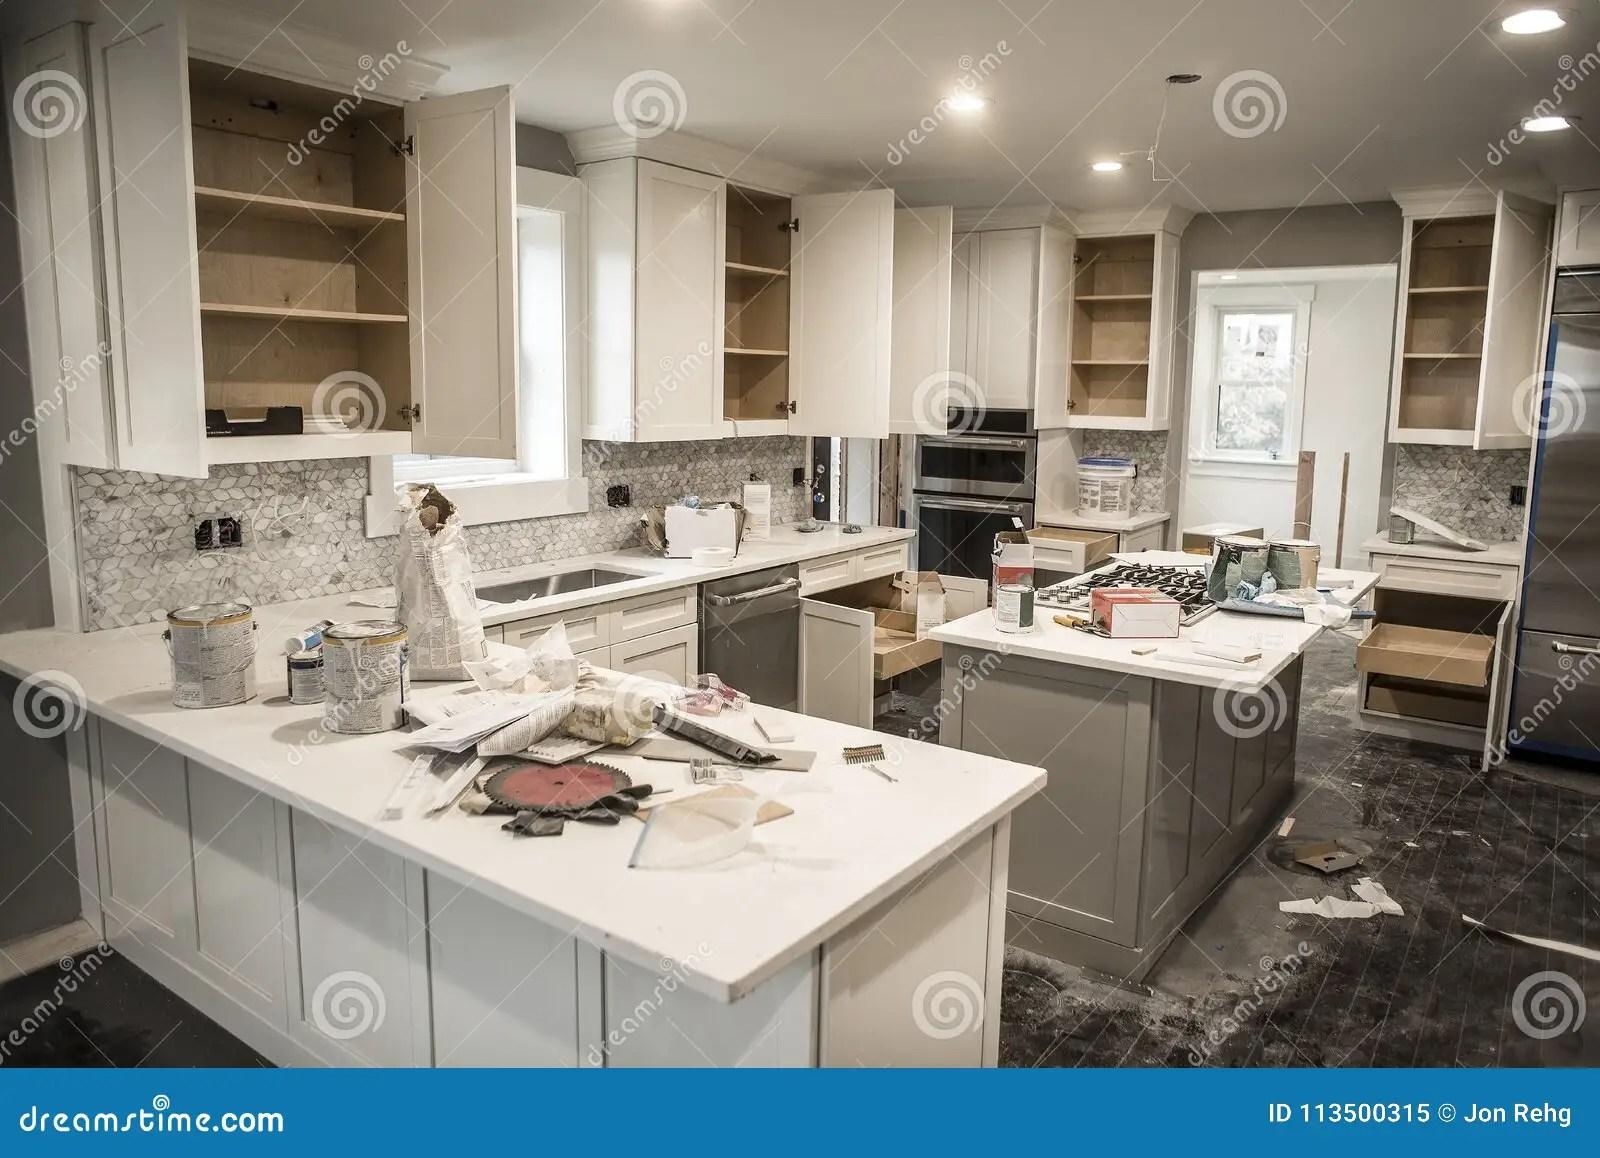 kitchen paints commercial supply store 在改造的杂乱家庭厨房与橱门期间打开凌乱与油漆罐头 工具和肮脏的旧布